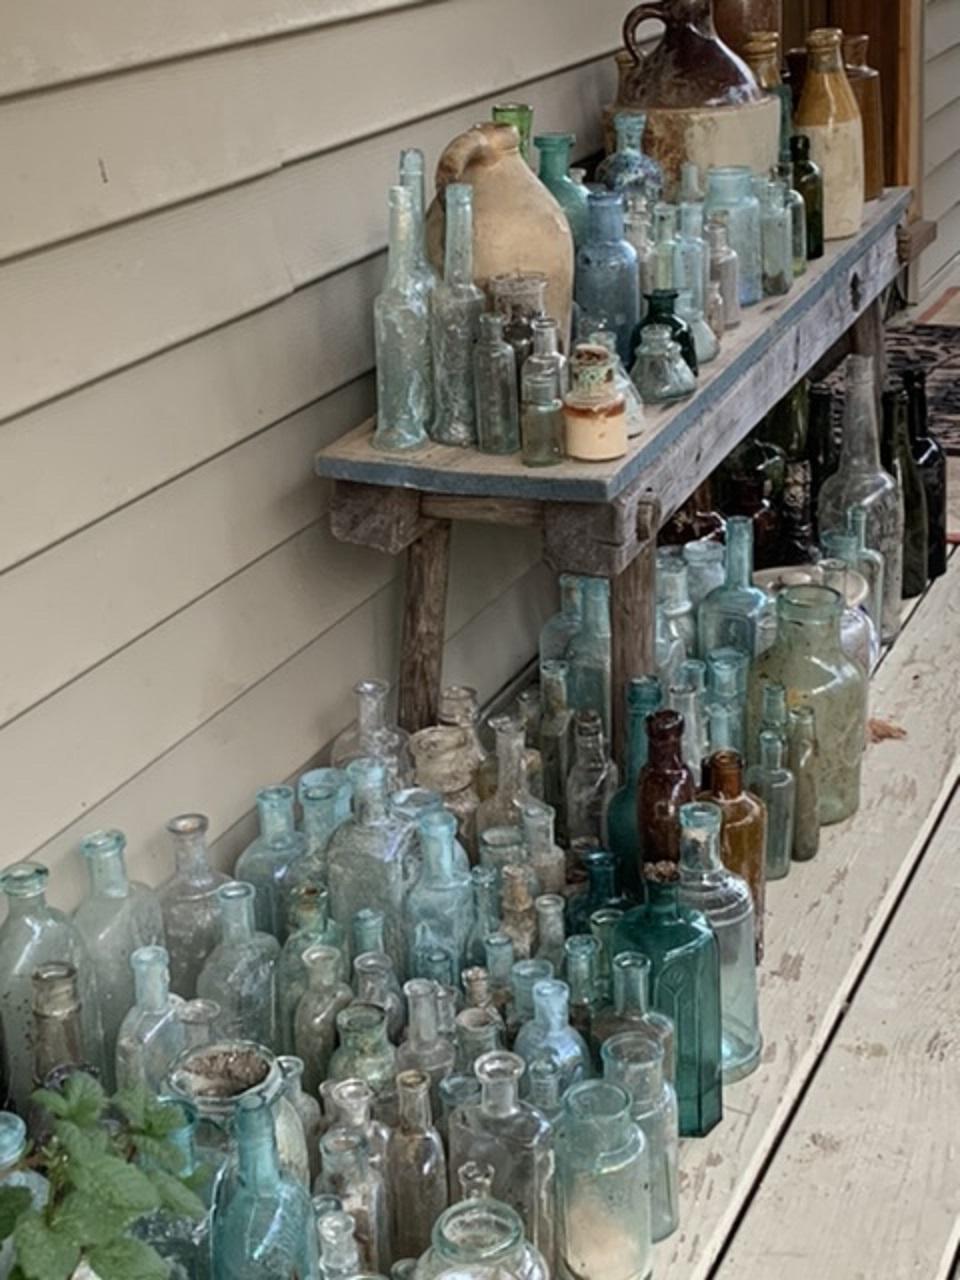 BottleSiteNHfinds.jpeg